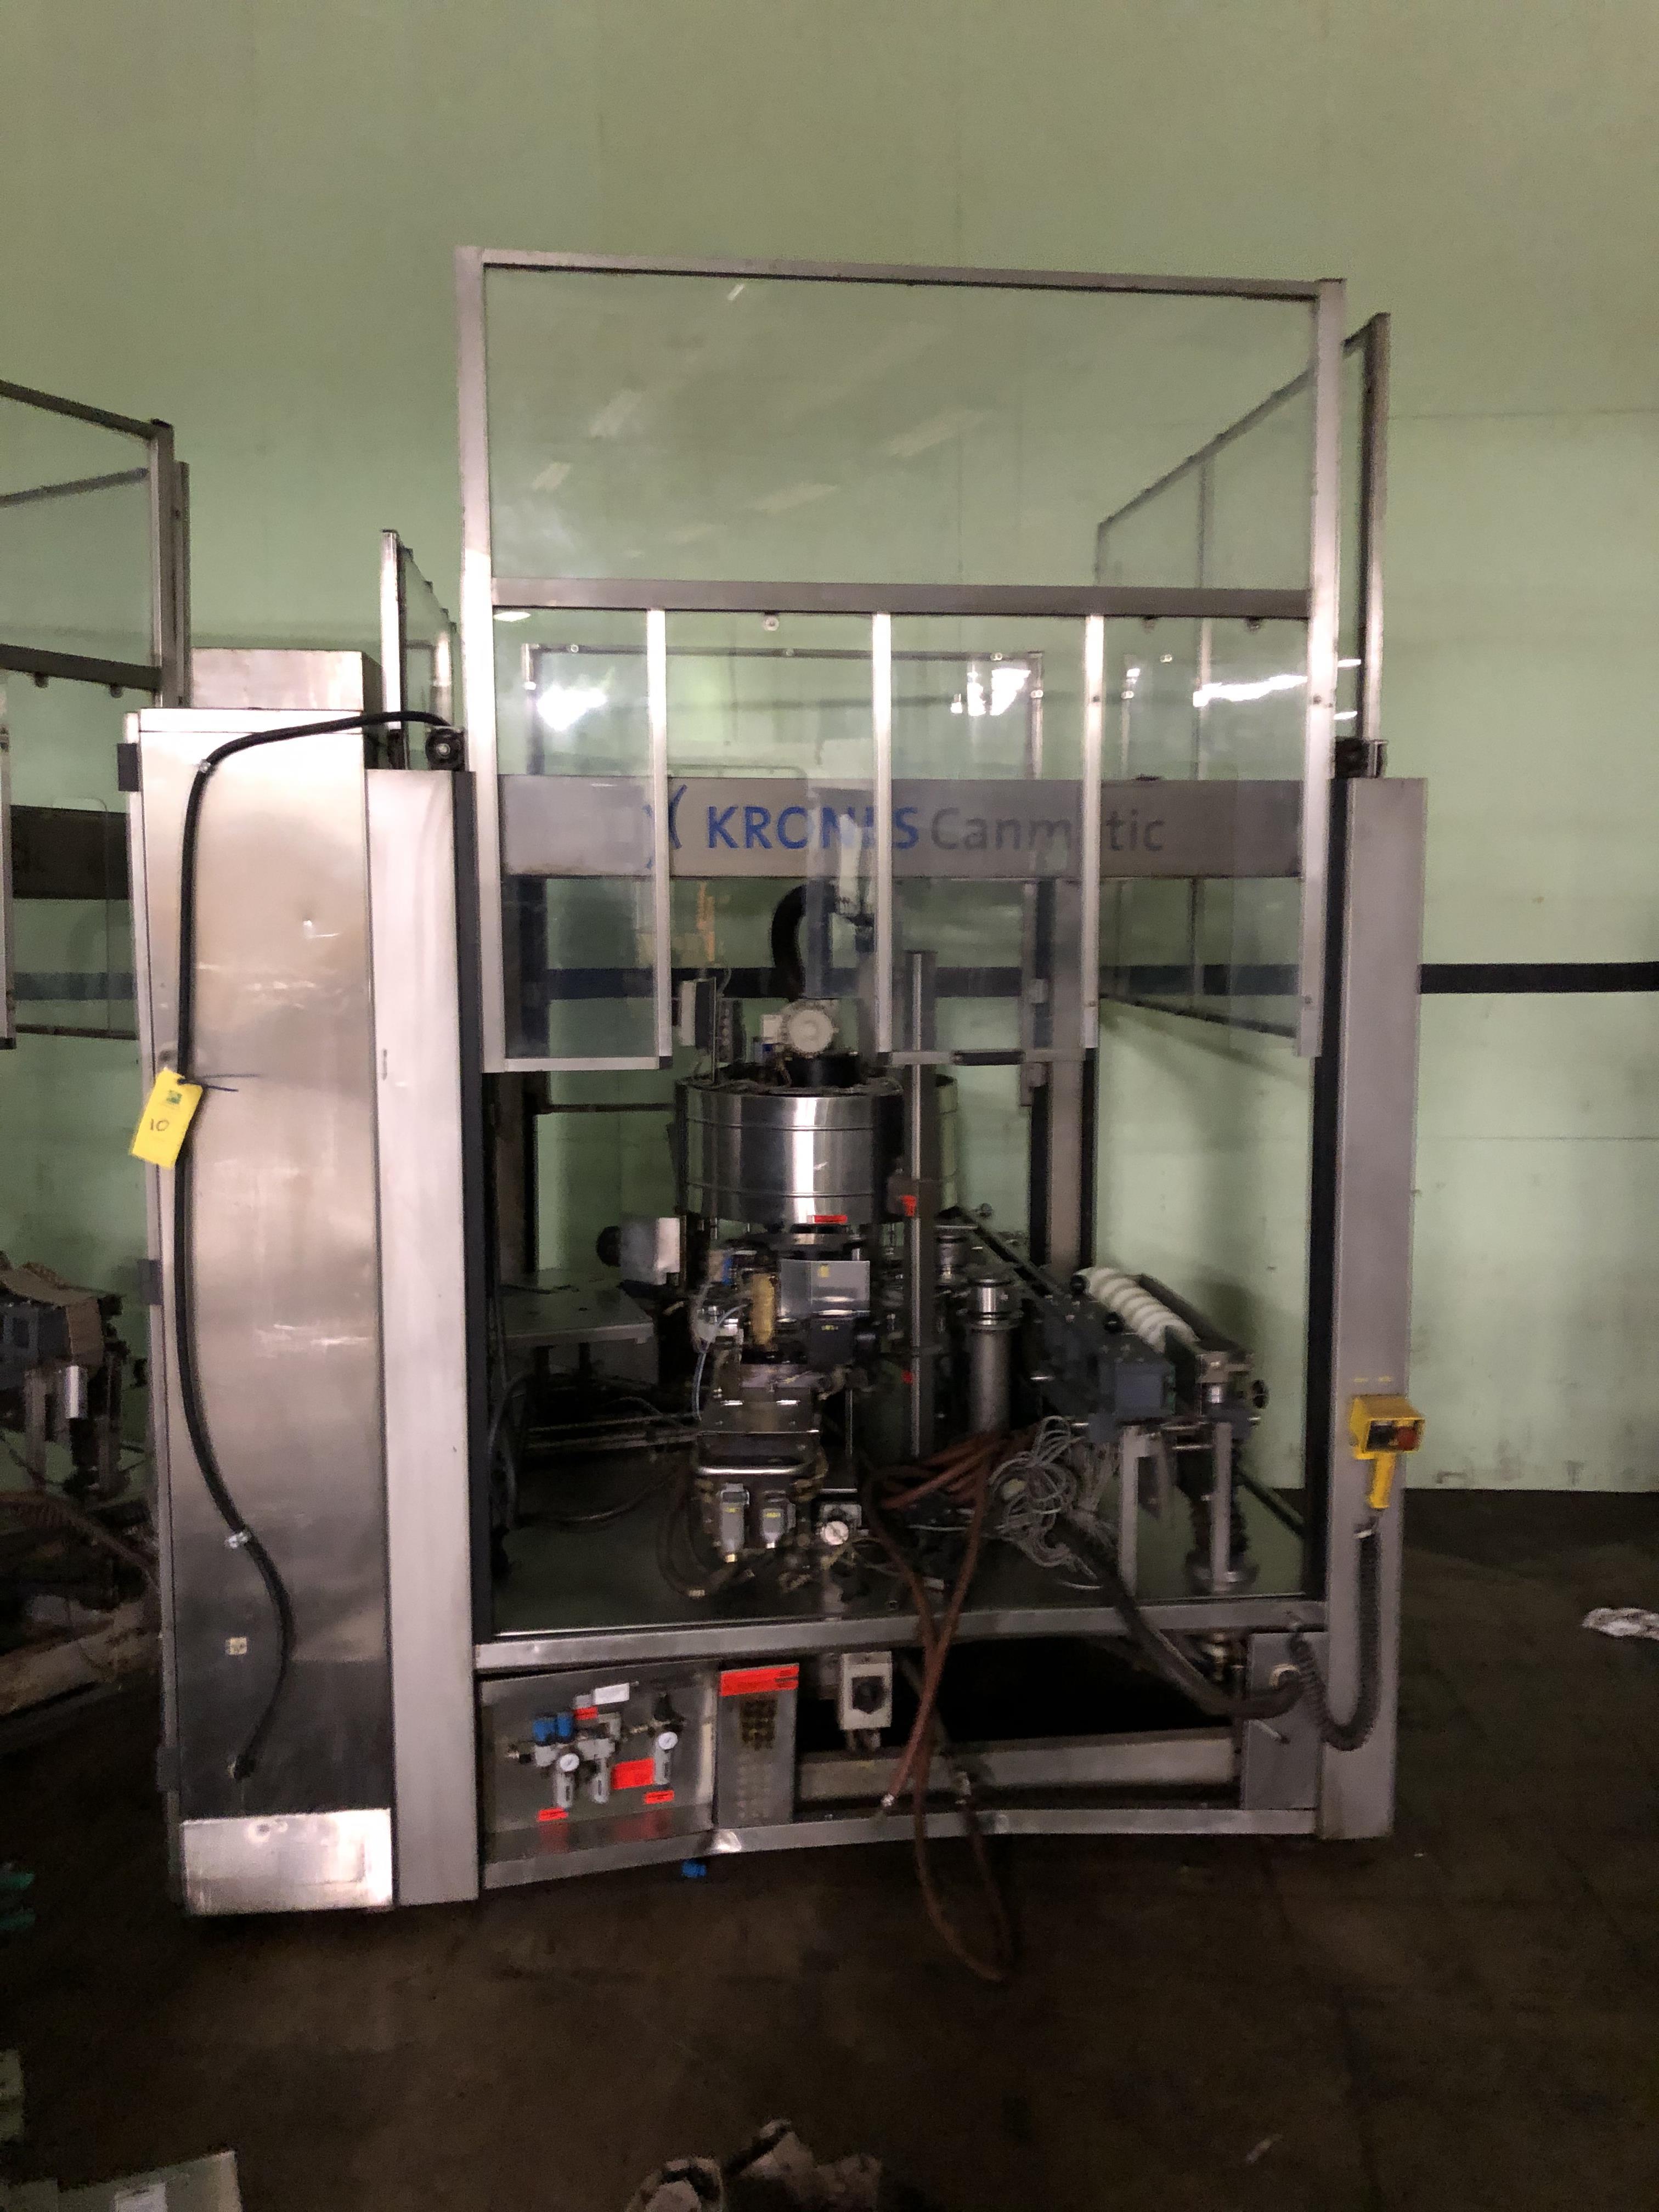 Krones Canmatic Labeler, Machine #073-Q84, RIGGING FEE - $1750